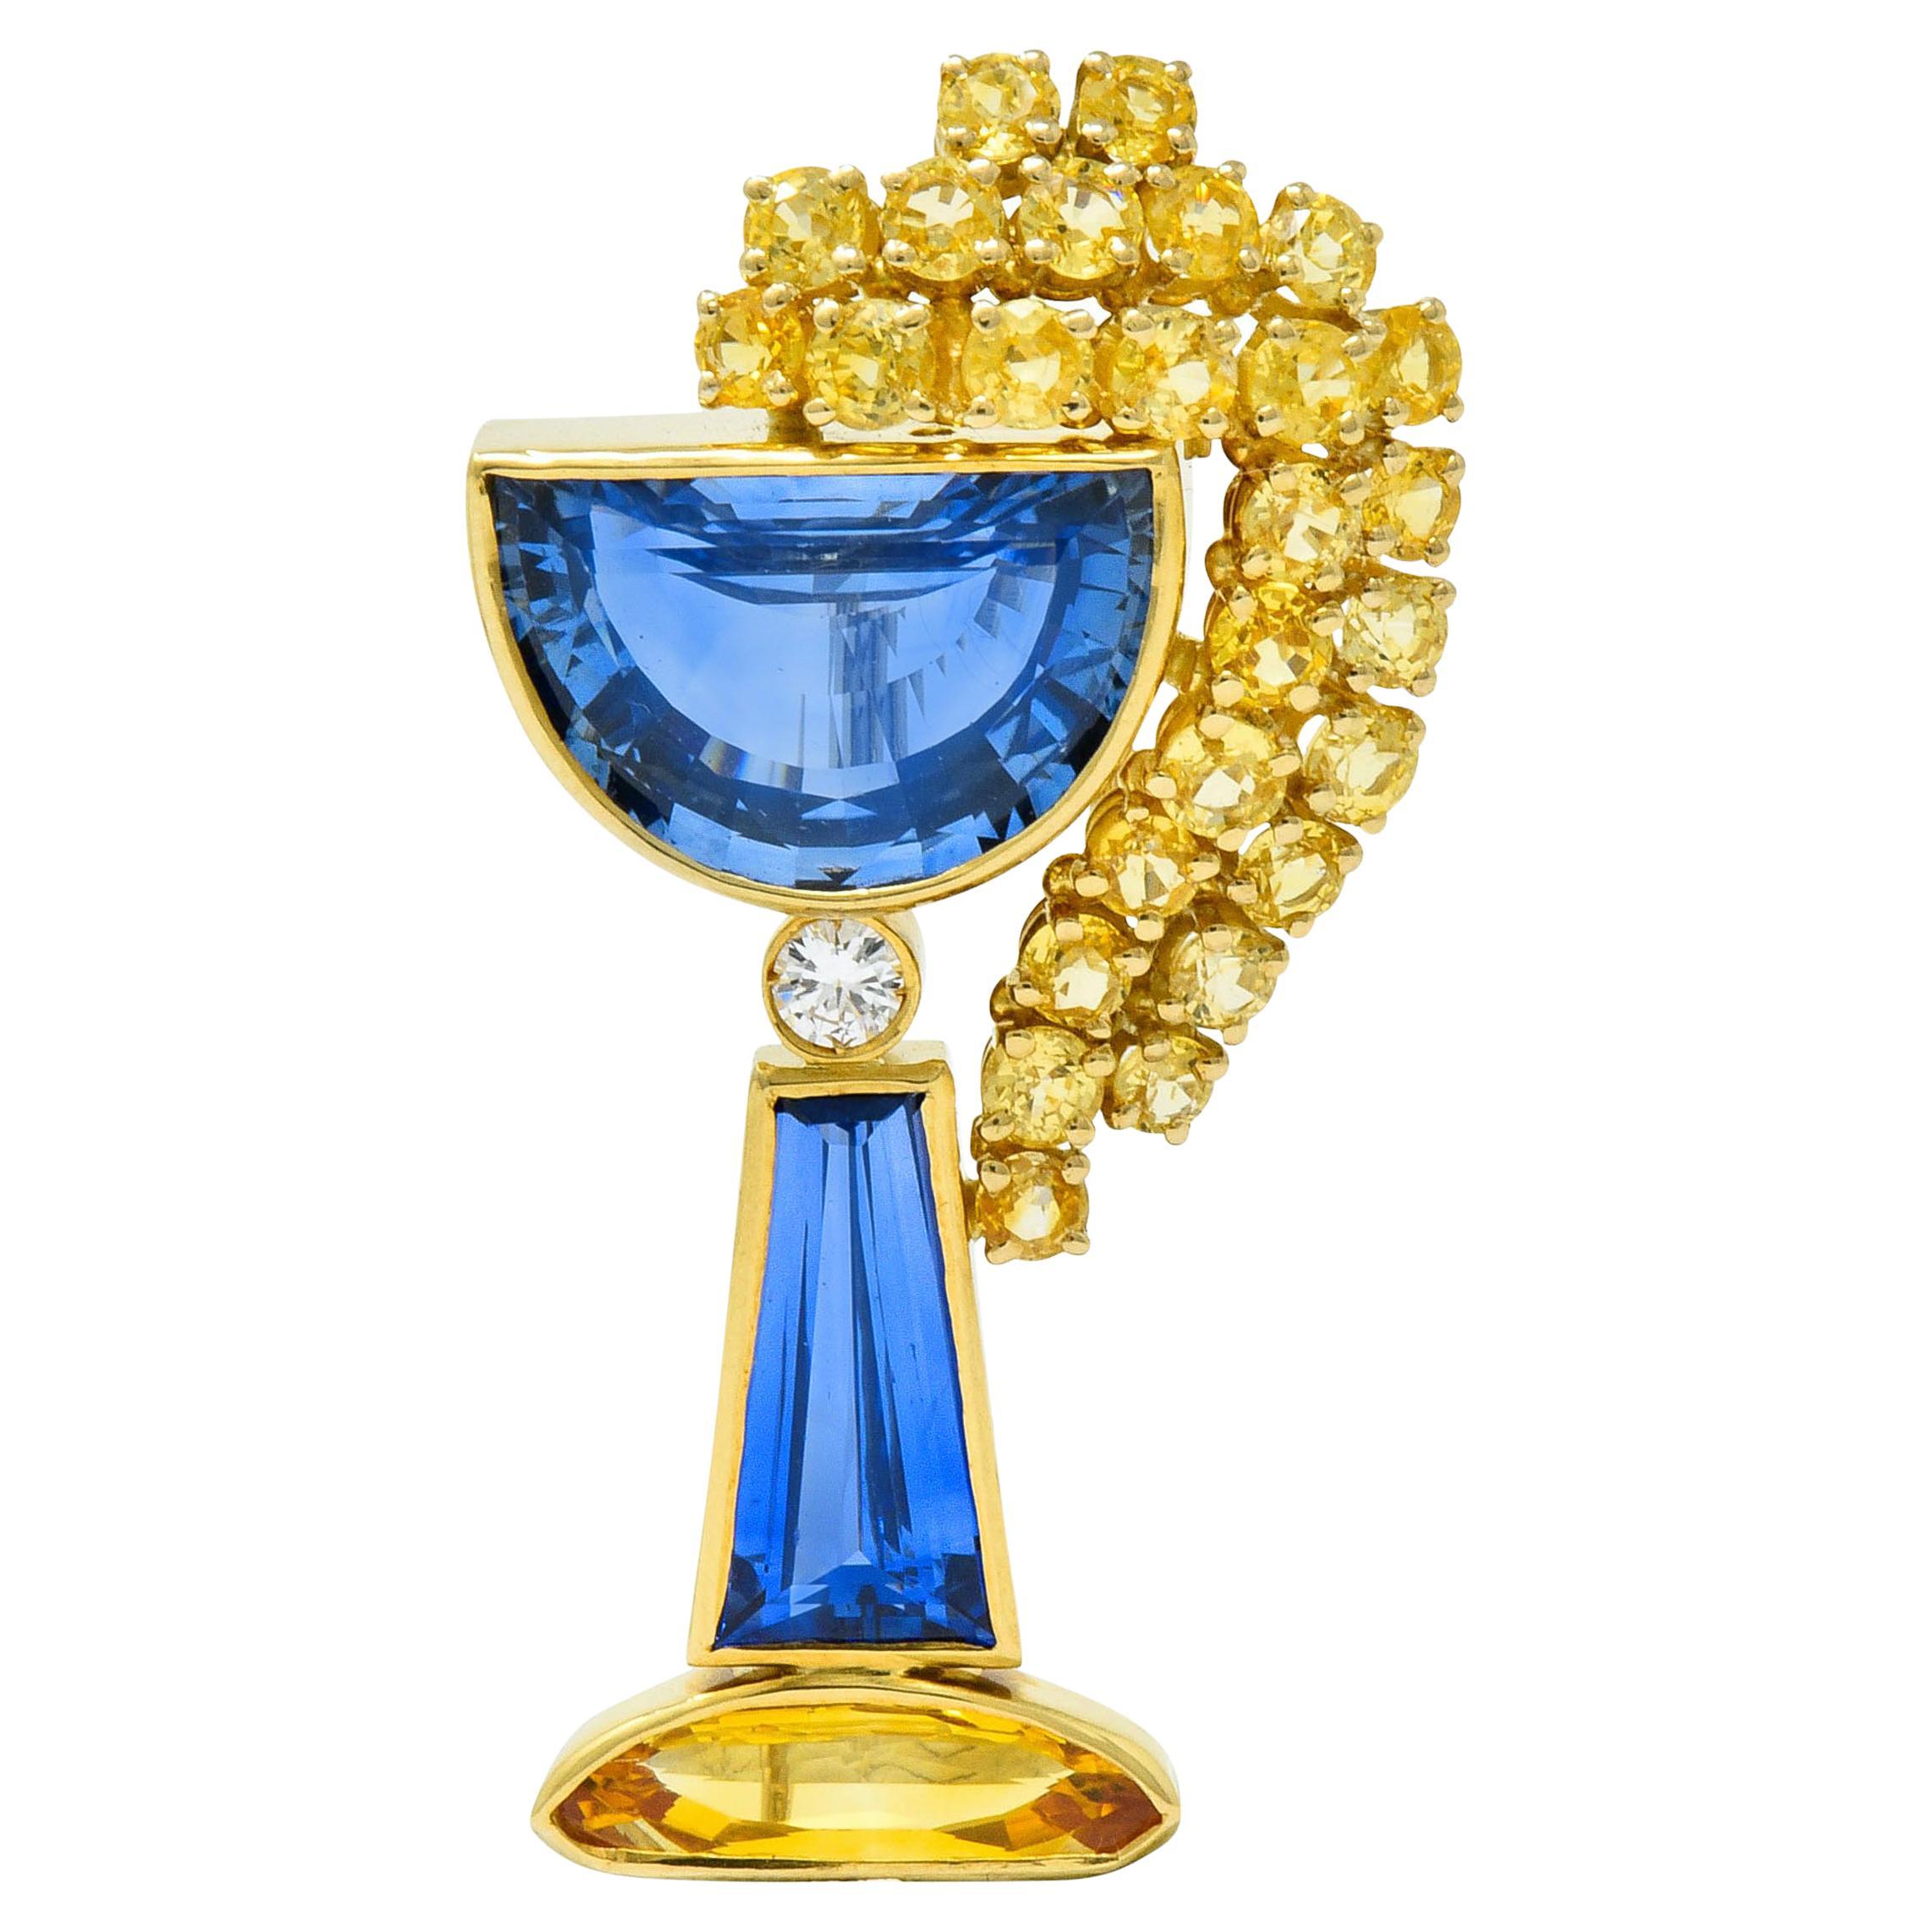 French 13.60 Carat Sapphire Diamond 18 Karat Gold Goblet Brooch